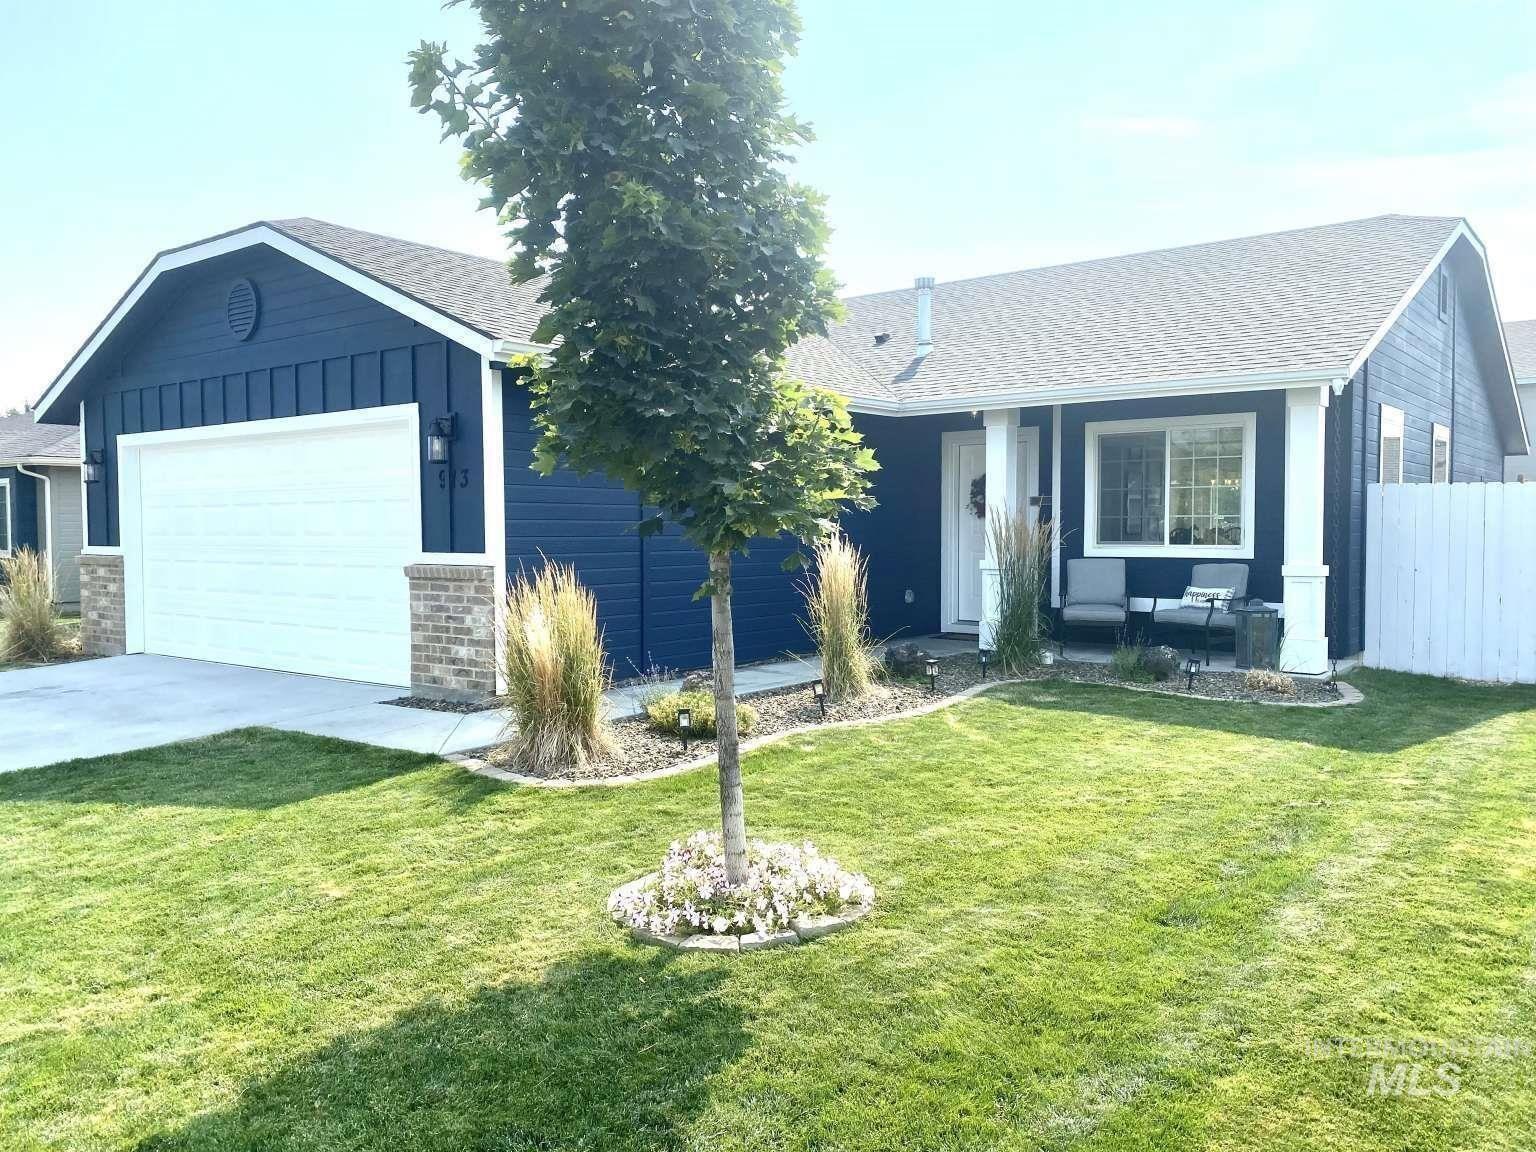 Photo of 913 S Theave Ave, Kuna, ID 83634 (MLS # 98811589)